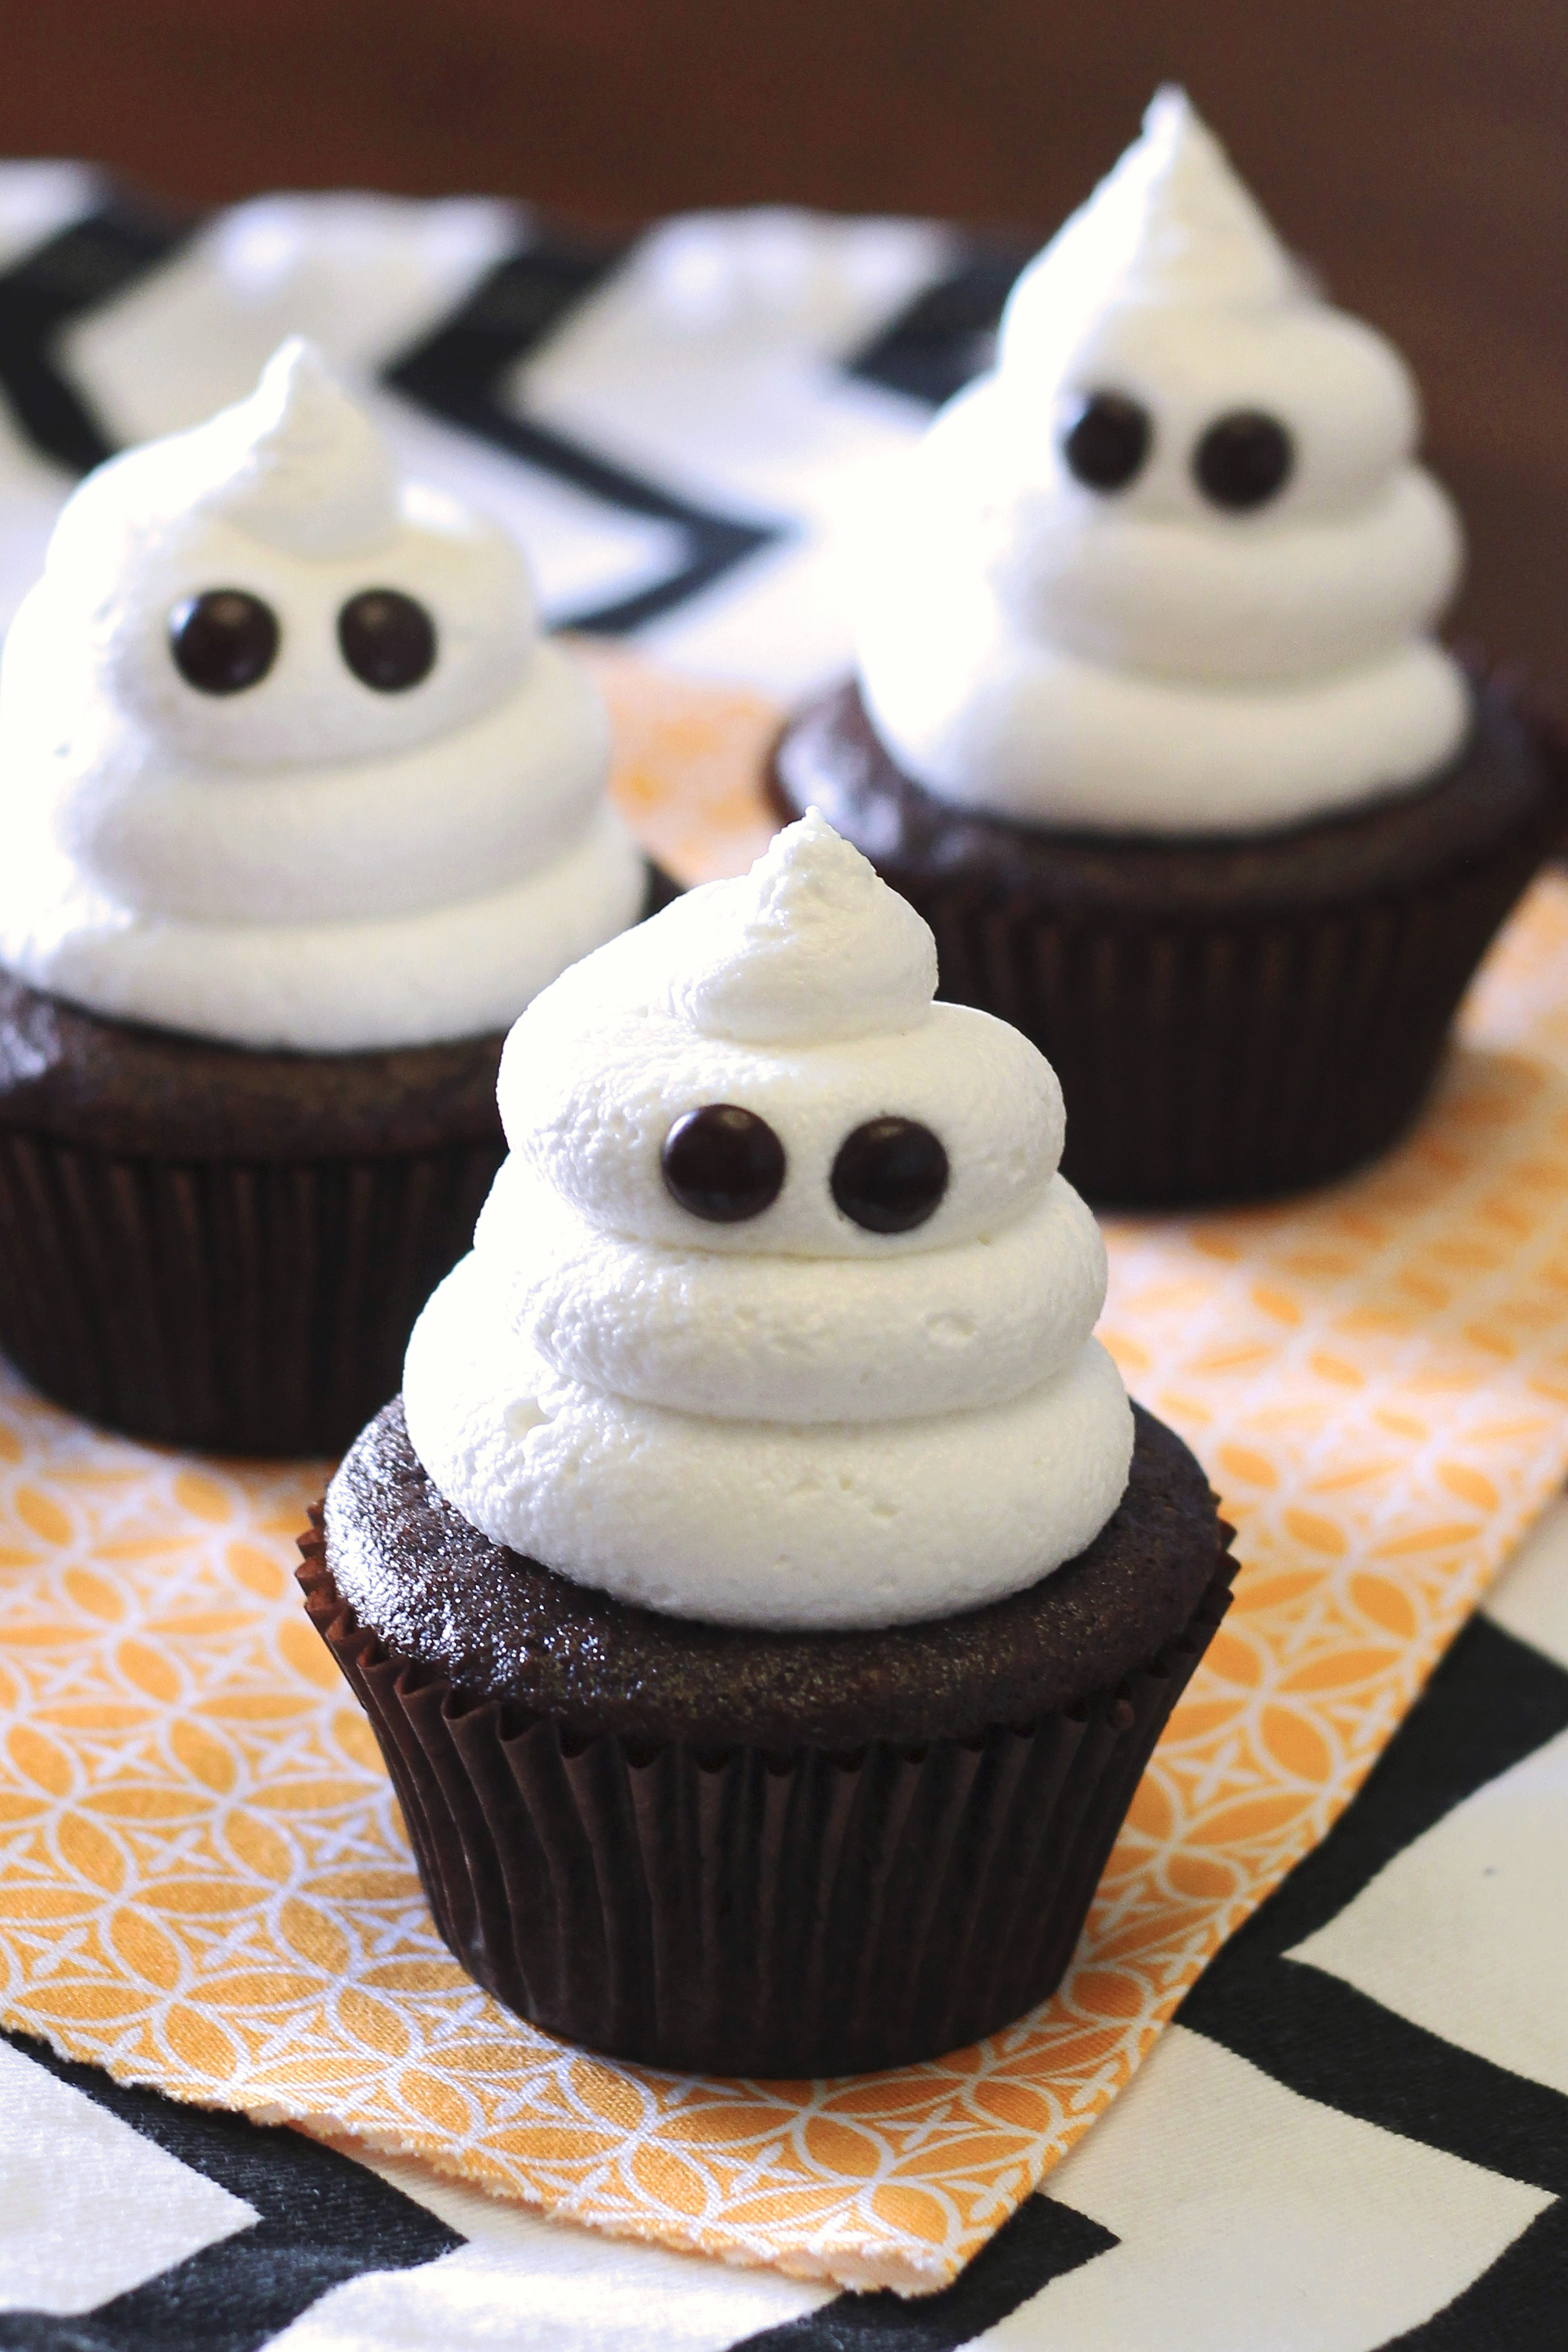 Halloween Cakes And Cupcakes  gluten free vegan ghost cupcakes Sarah Bakes Gluten Free